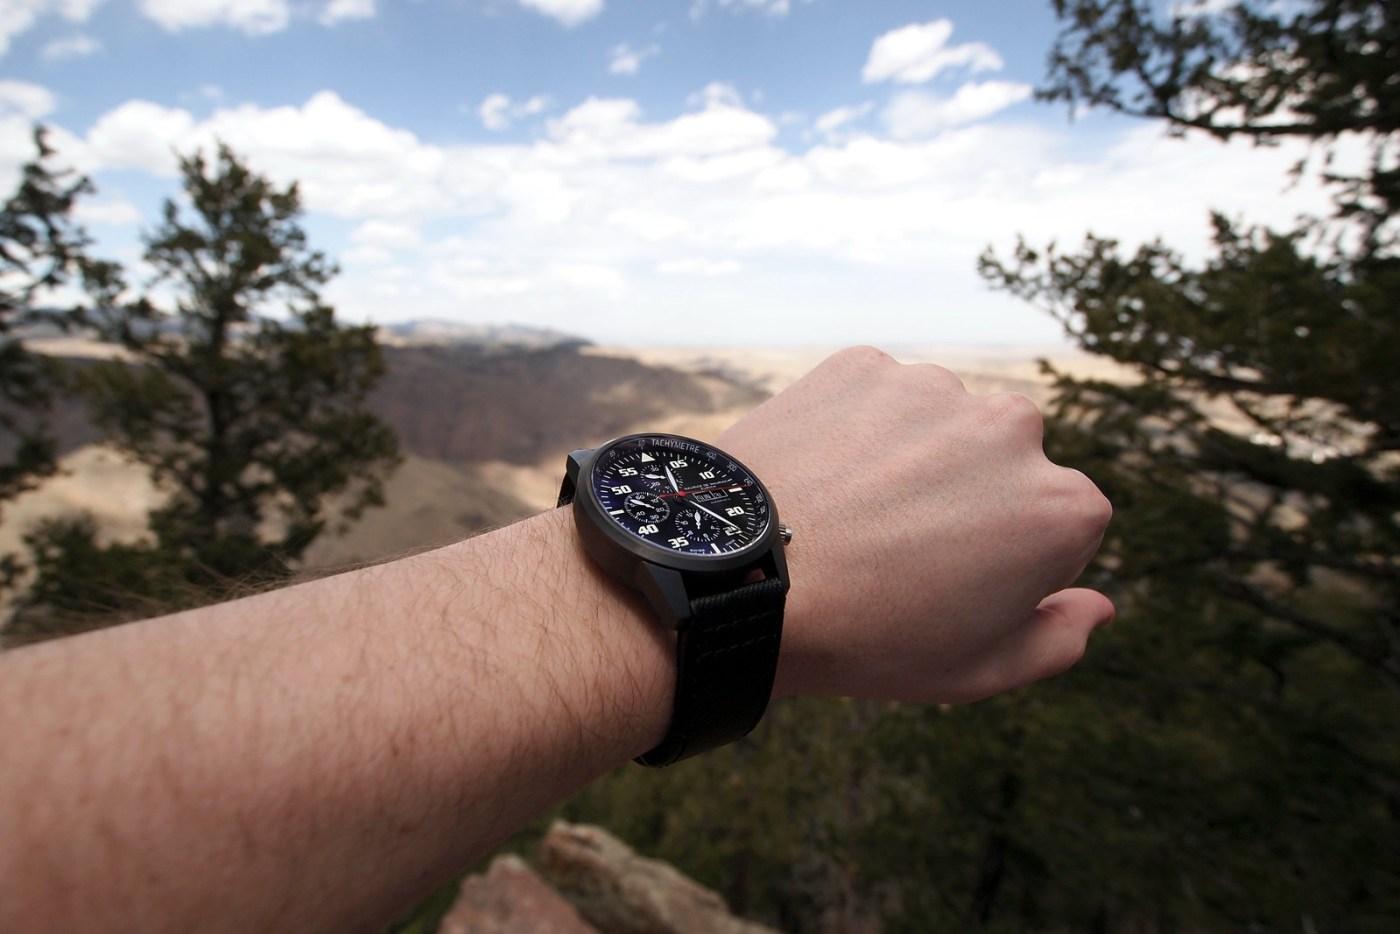 Maurice de Mauriac wristshot in Colorado